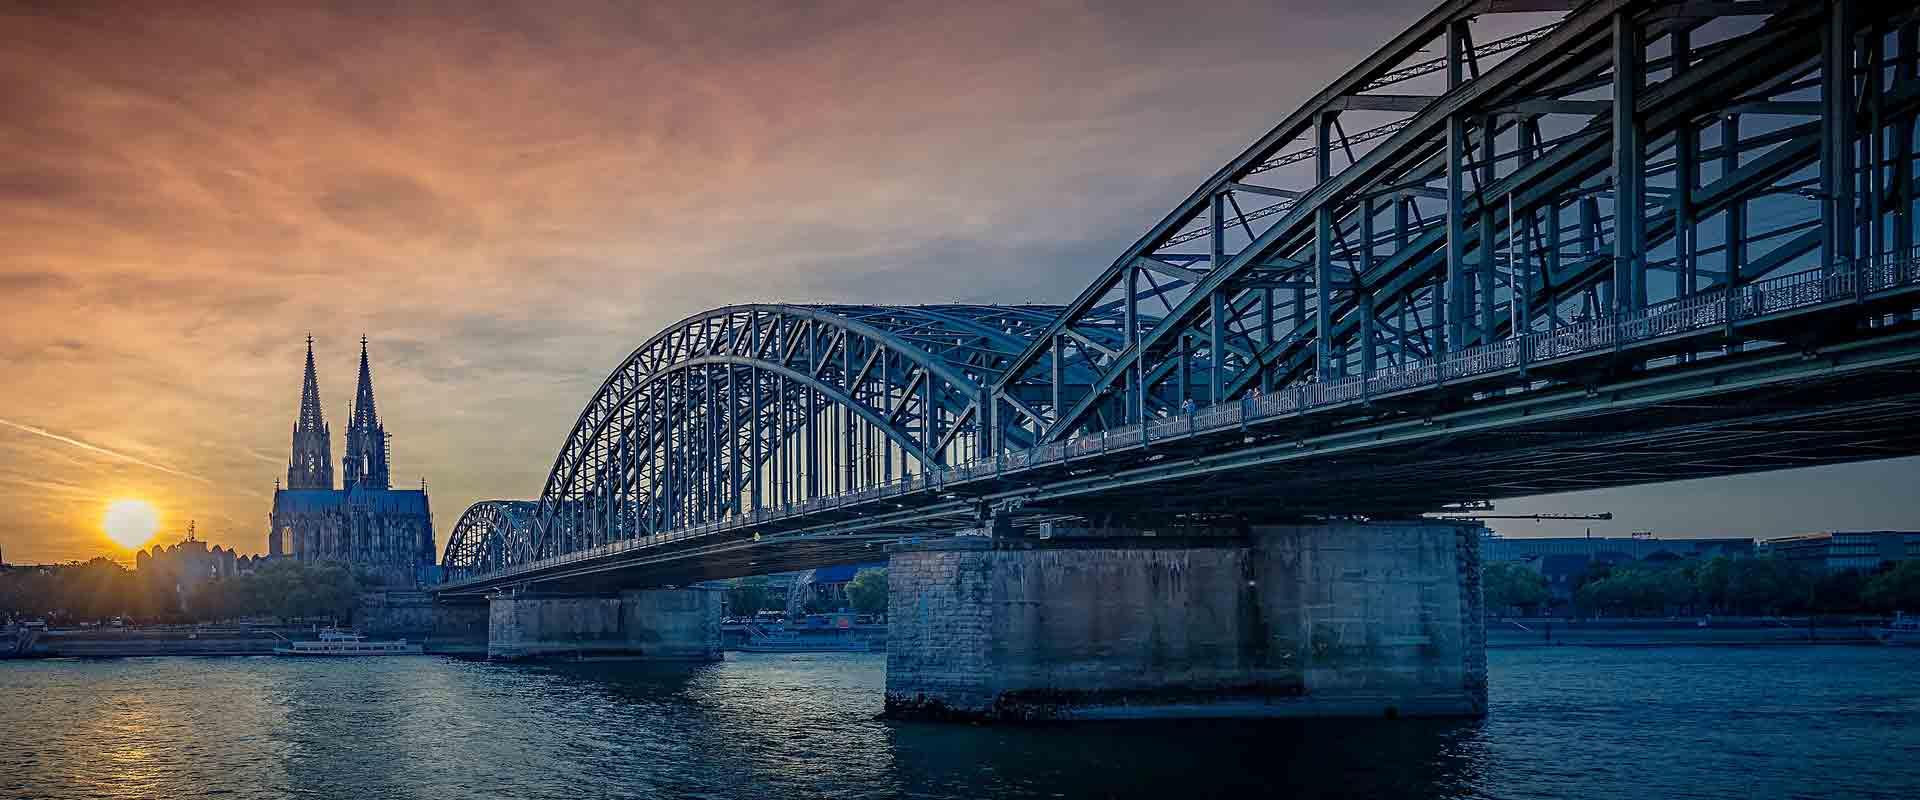 Trem de Colônia para Frankfurt